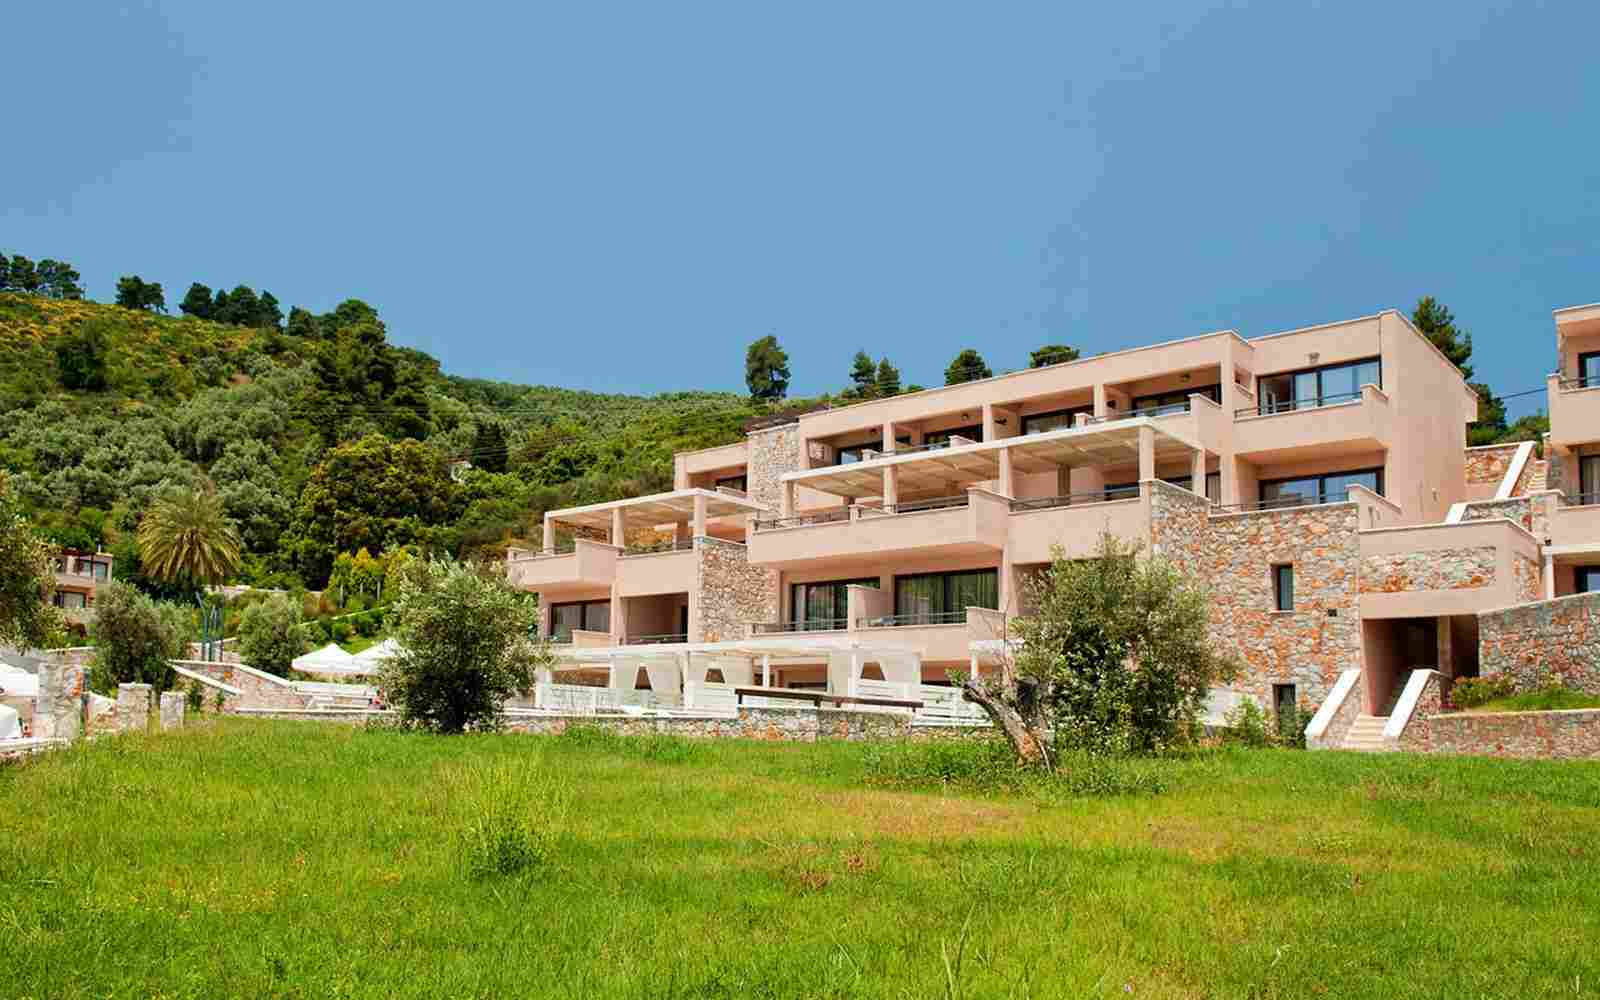 http://www.casacaribepuertomorelos.com/wp-content/uploads/2016/03/summer-hotel-01.jpg